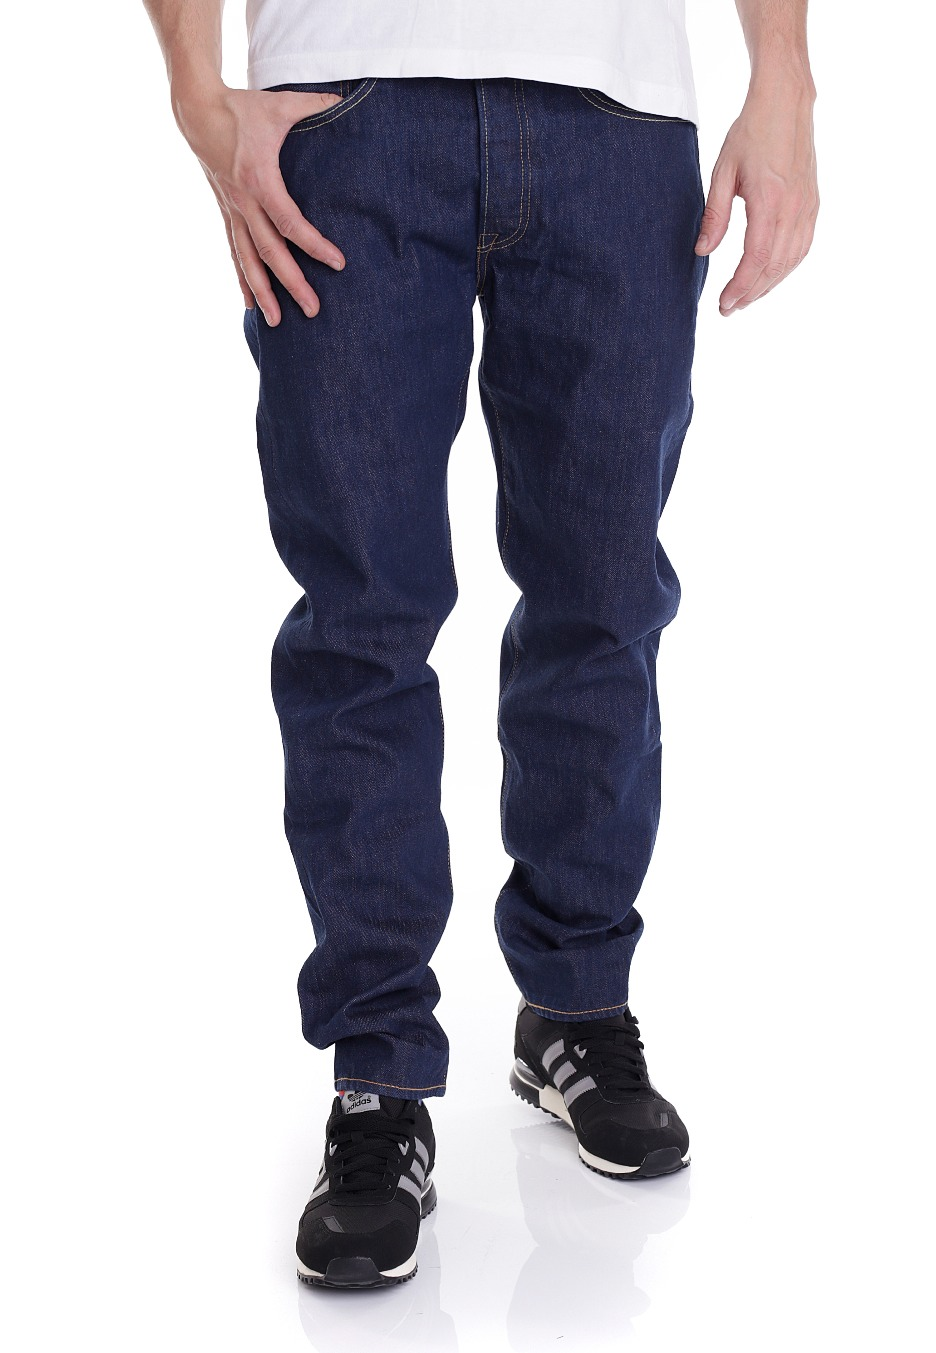 Levi Jeans For Men 501